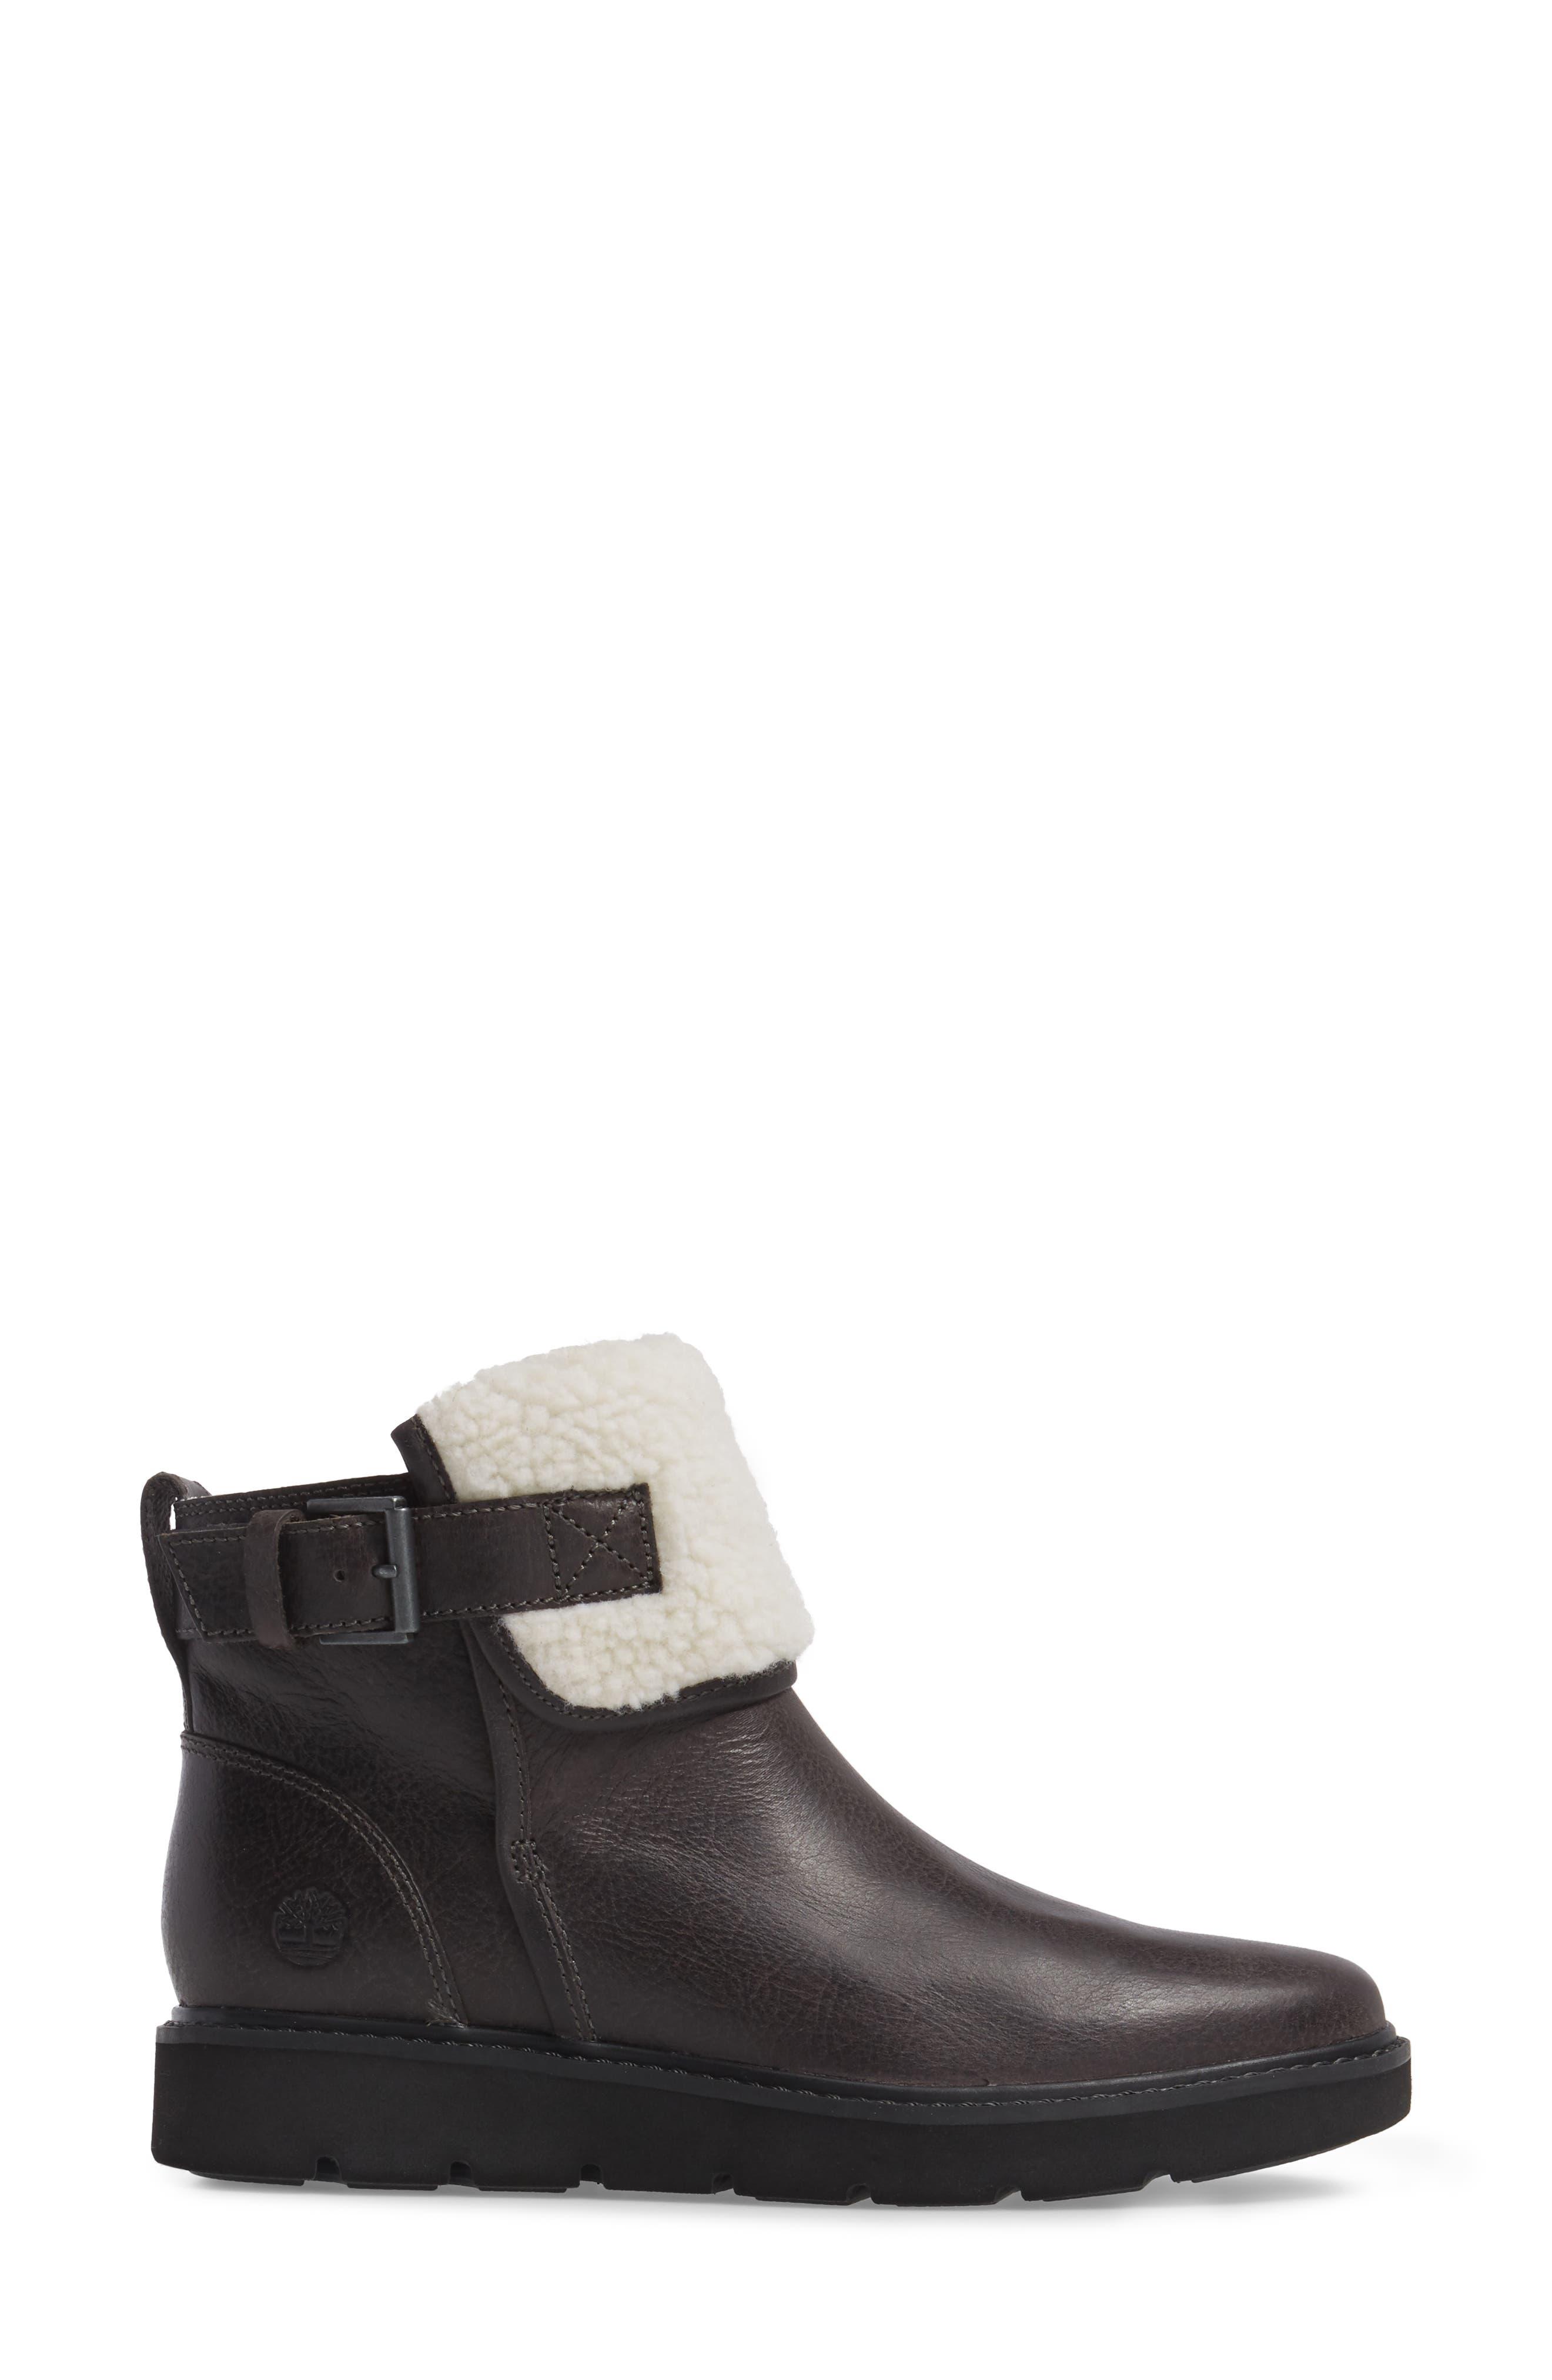 Kenniston Fleece Lined Boot,                             Alternate thumbnail 3, color,                             021